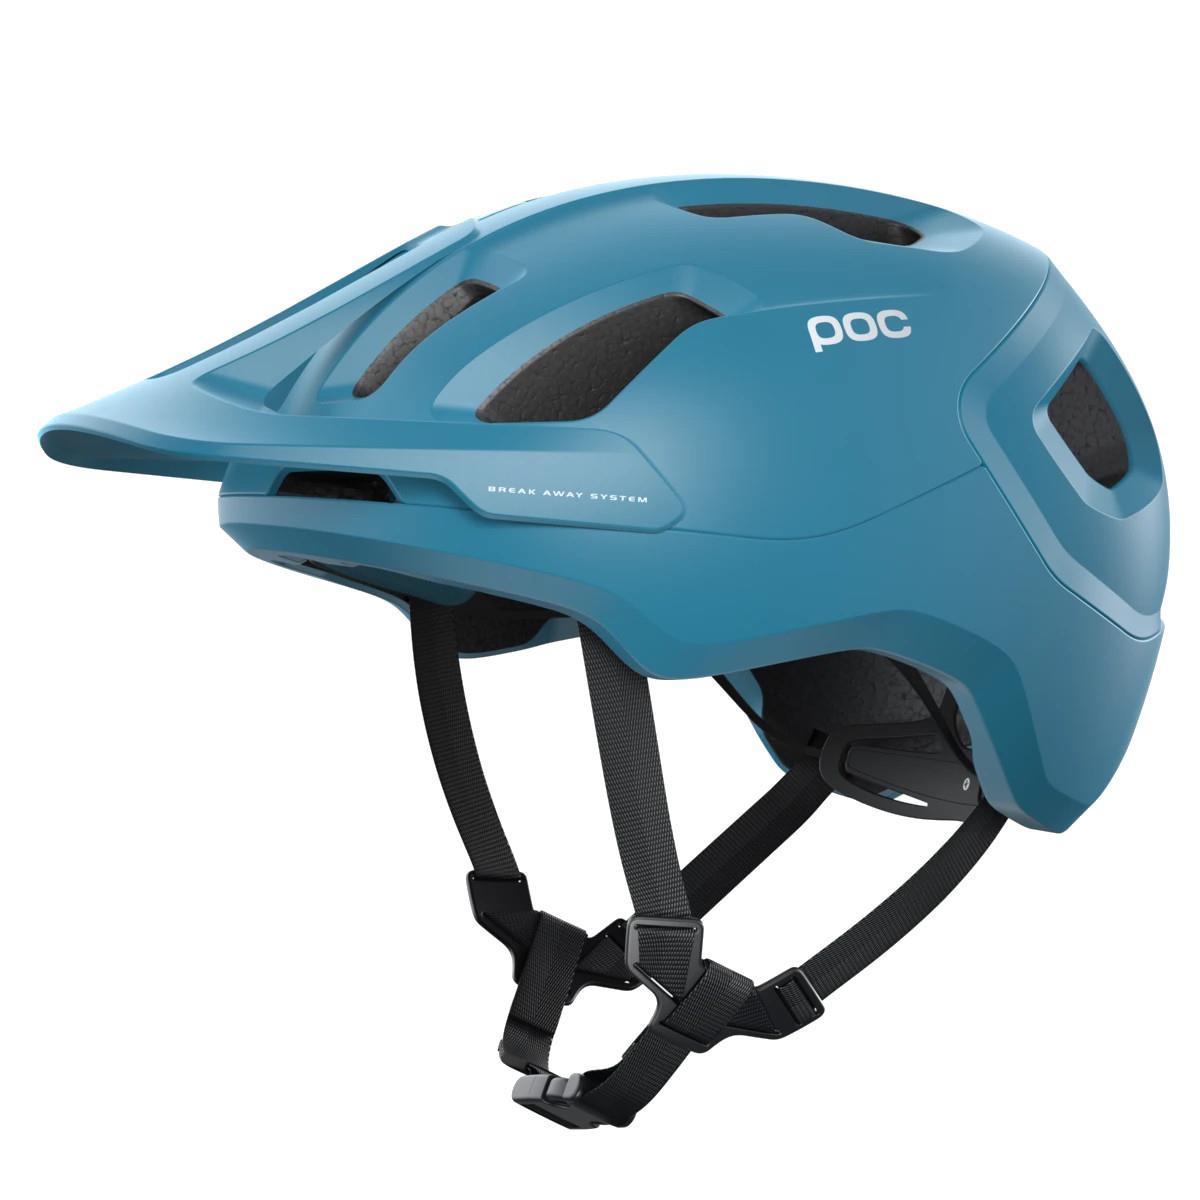 Enduro Helmet Axion SPIN Basalt Blue Size XS/S (51-54cm)